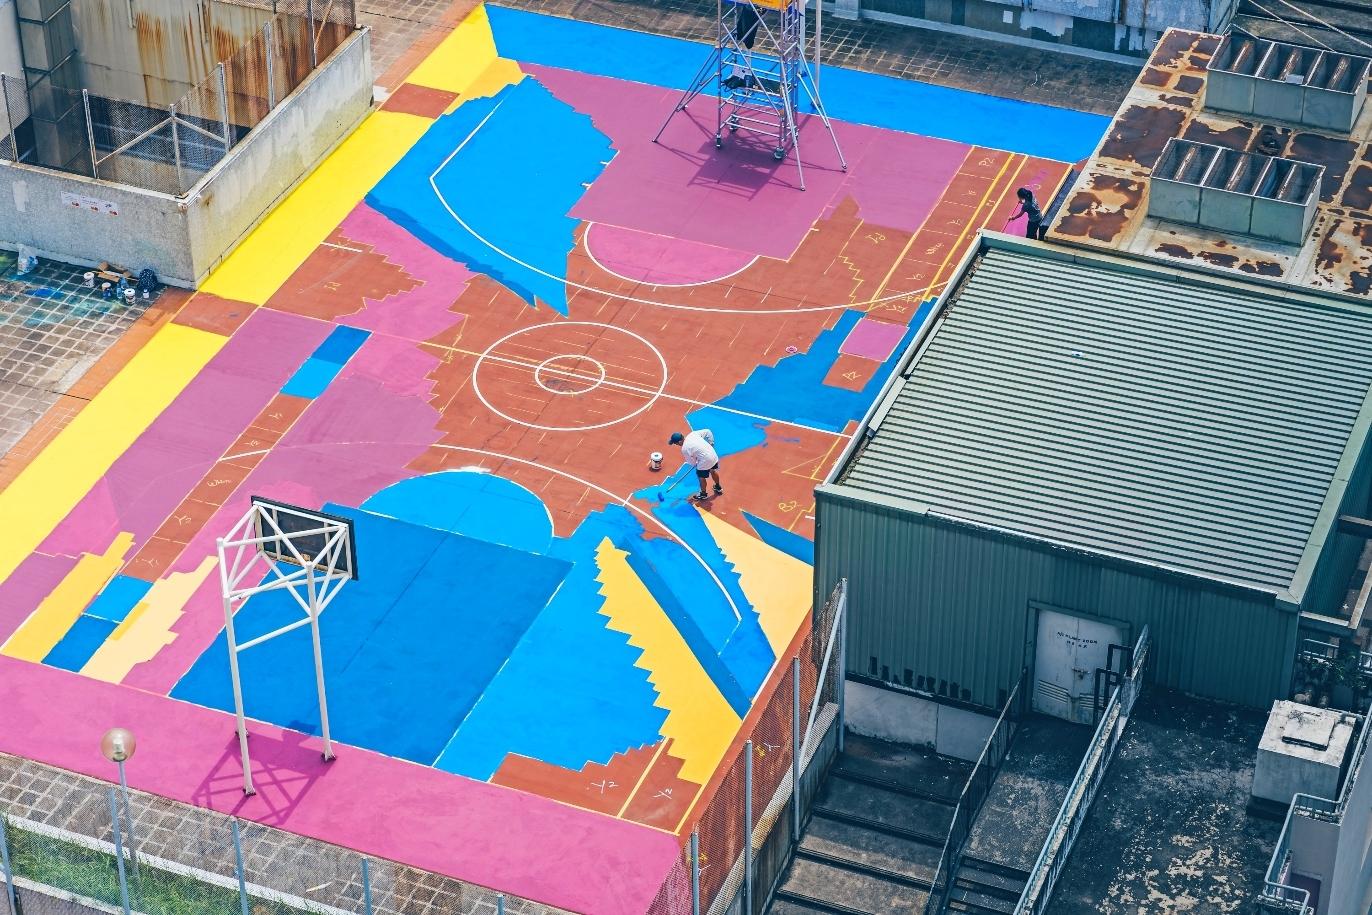 H.A.N.D.S basketball court tuen mun